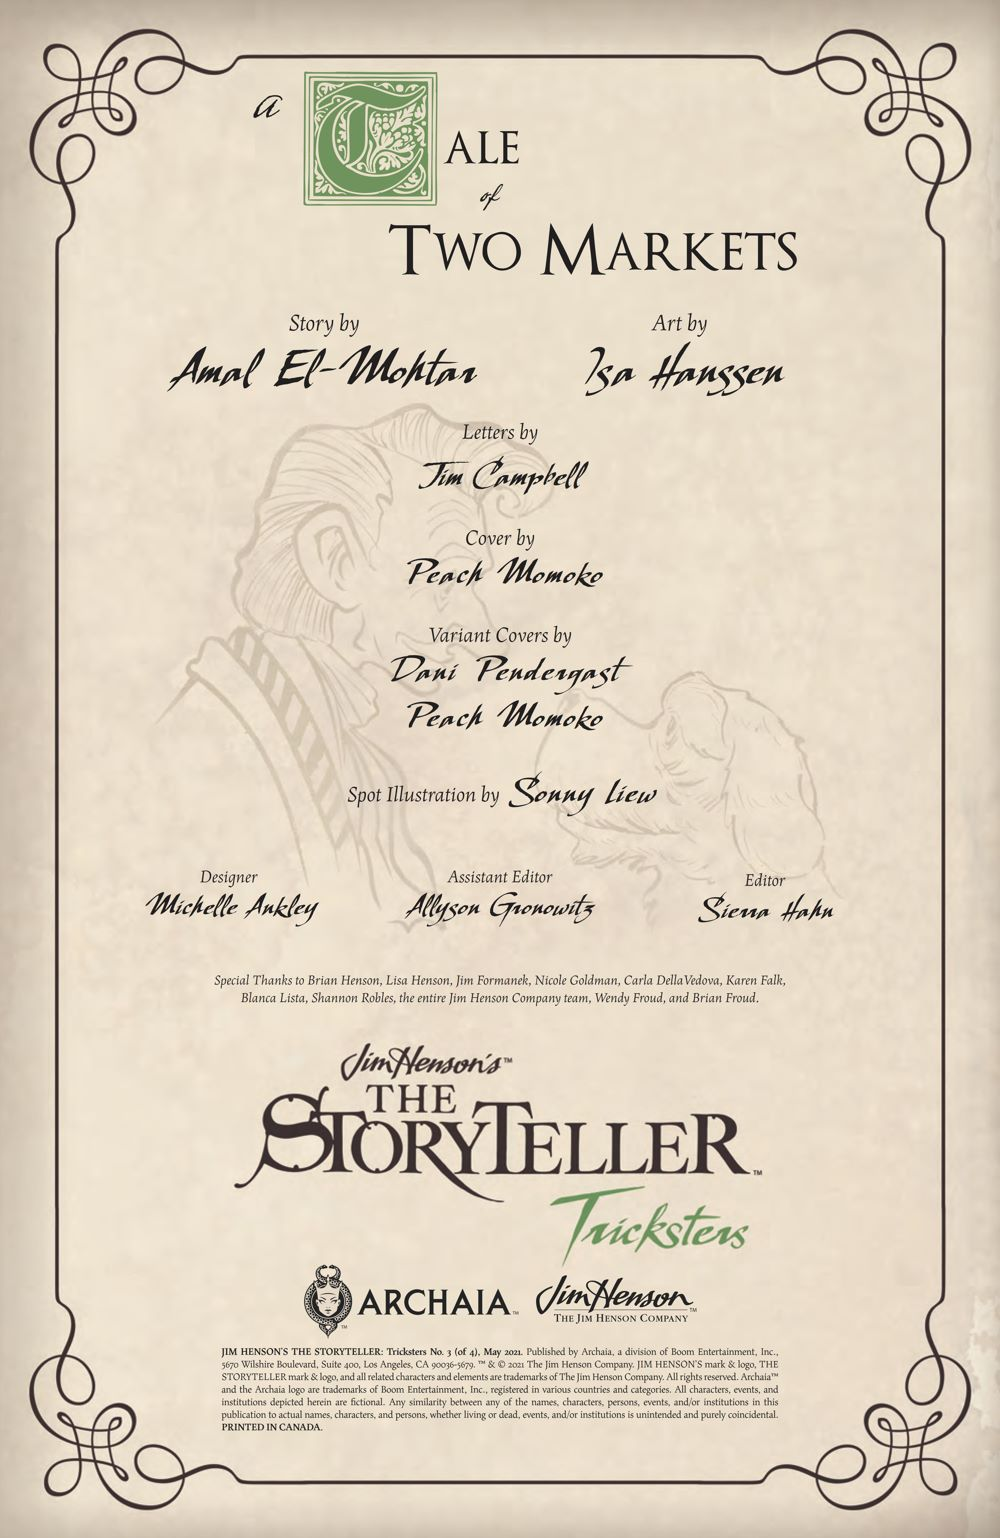 StorytellerTricksters_003_PRESS_2 ComicList Previews: JIM HENSON'S THE STORYTELLER TRICKSTERS #3 (OF 4)